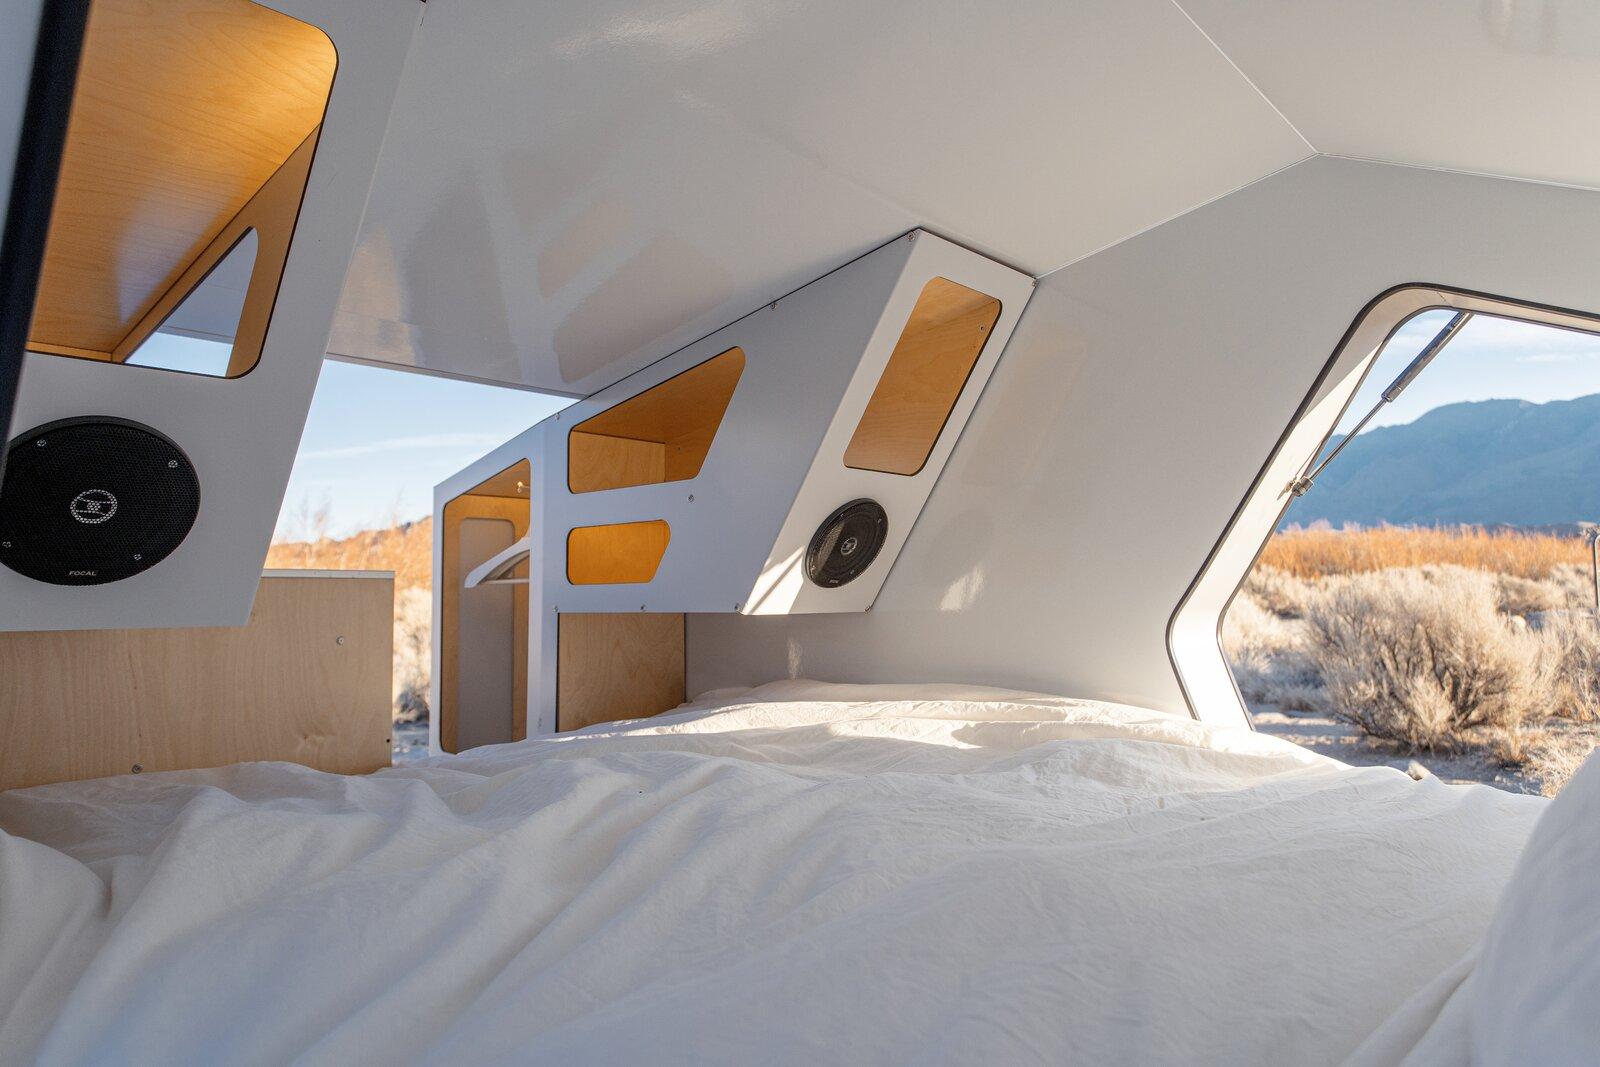 Polydrops P17A Trailer bedroom